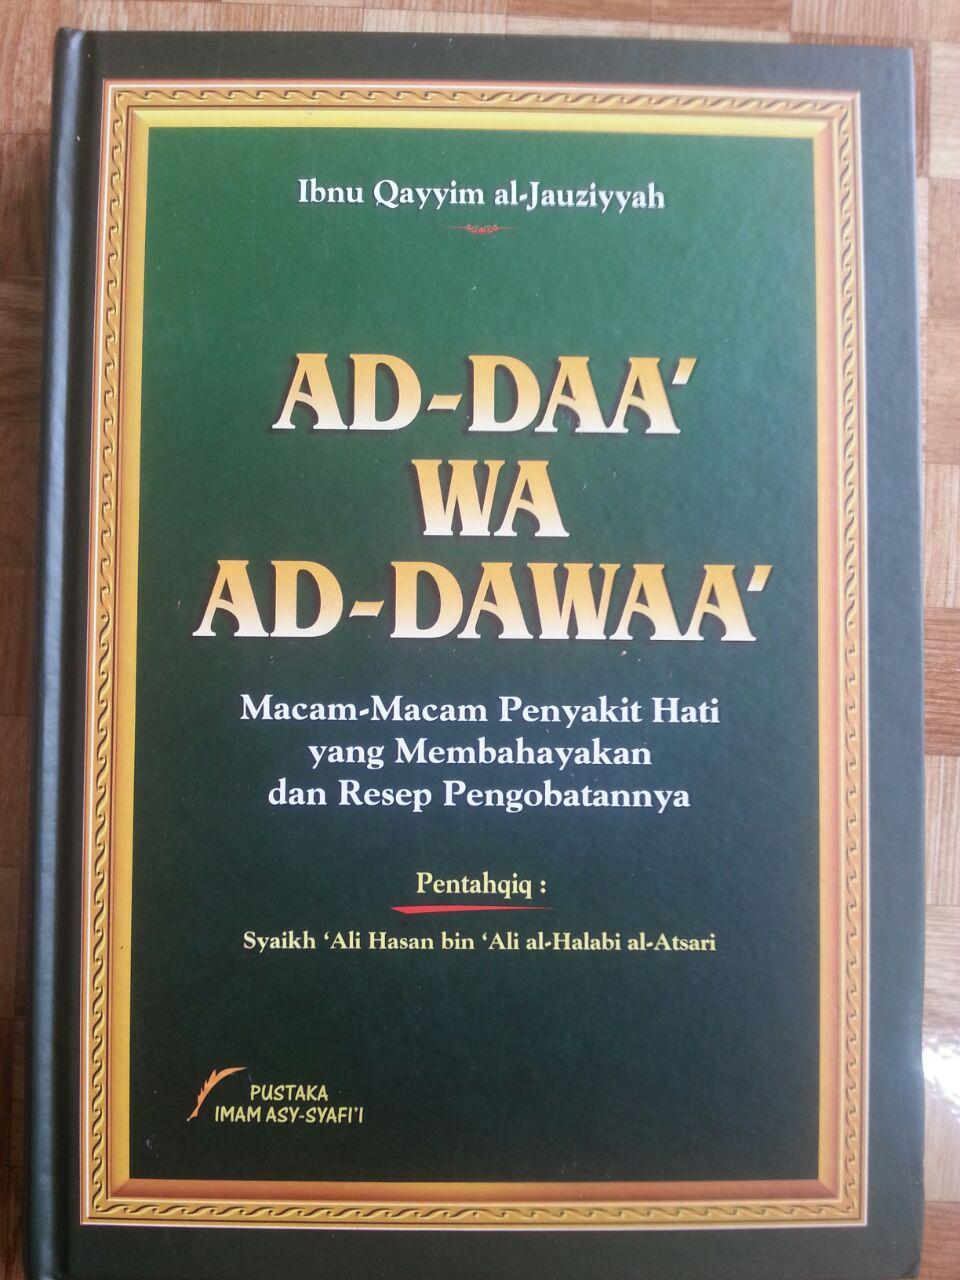 Buku Pengobatan Ad-Daa' wa ad-Dawaa' cover 2